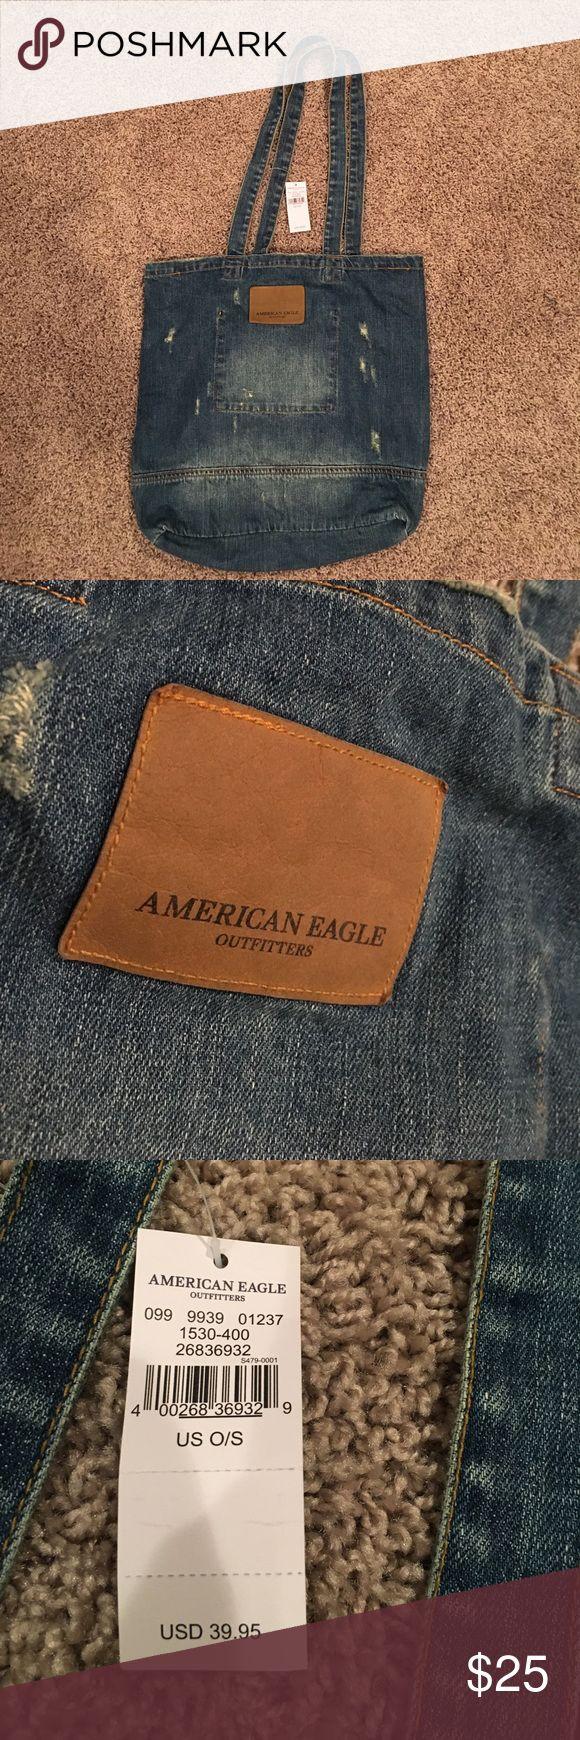 American Eagle denim purse - Denim purse  - Great for the beach - Brand new - Originally $40 - Never used - American Eagle American Eagle Outfitters Bags Shoulder Bags